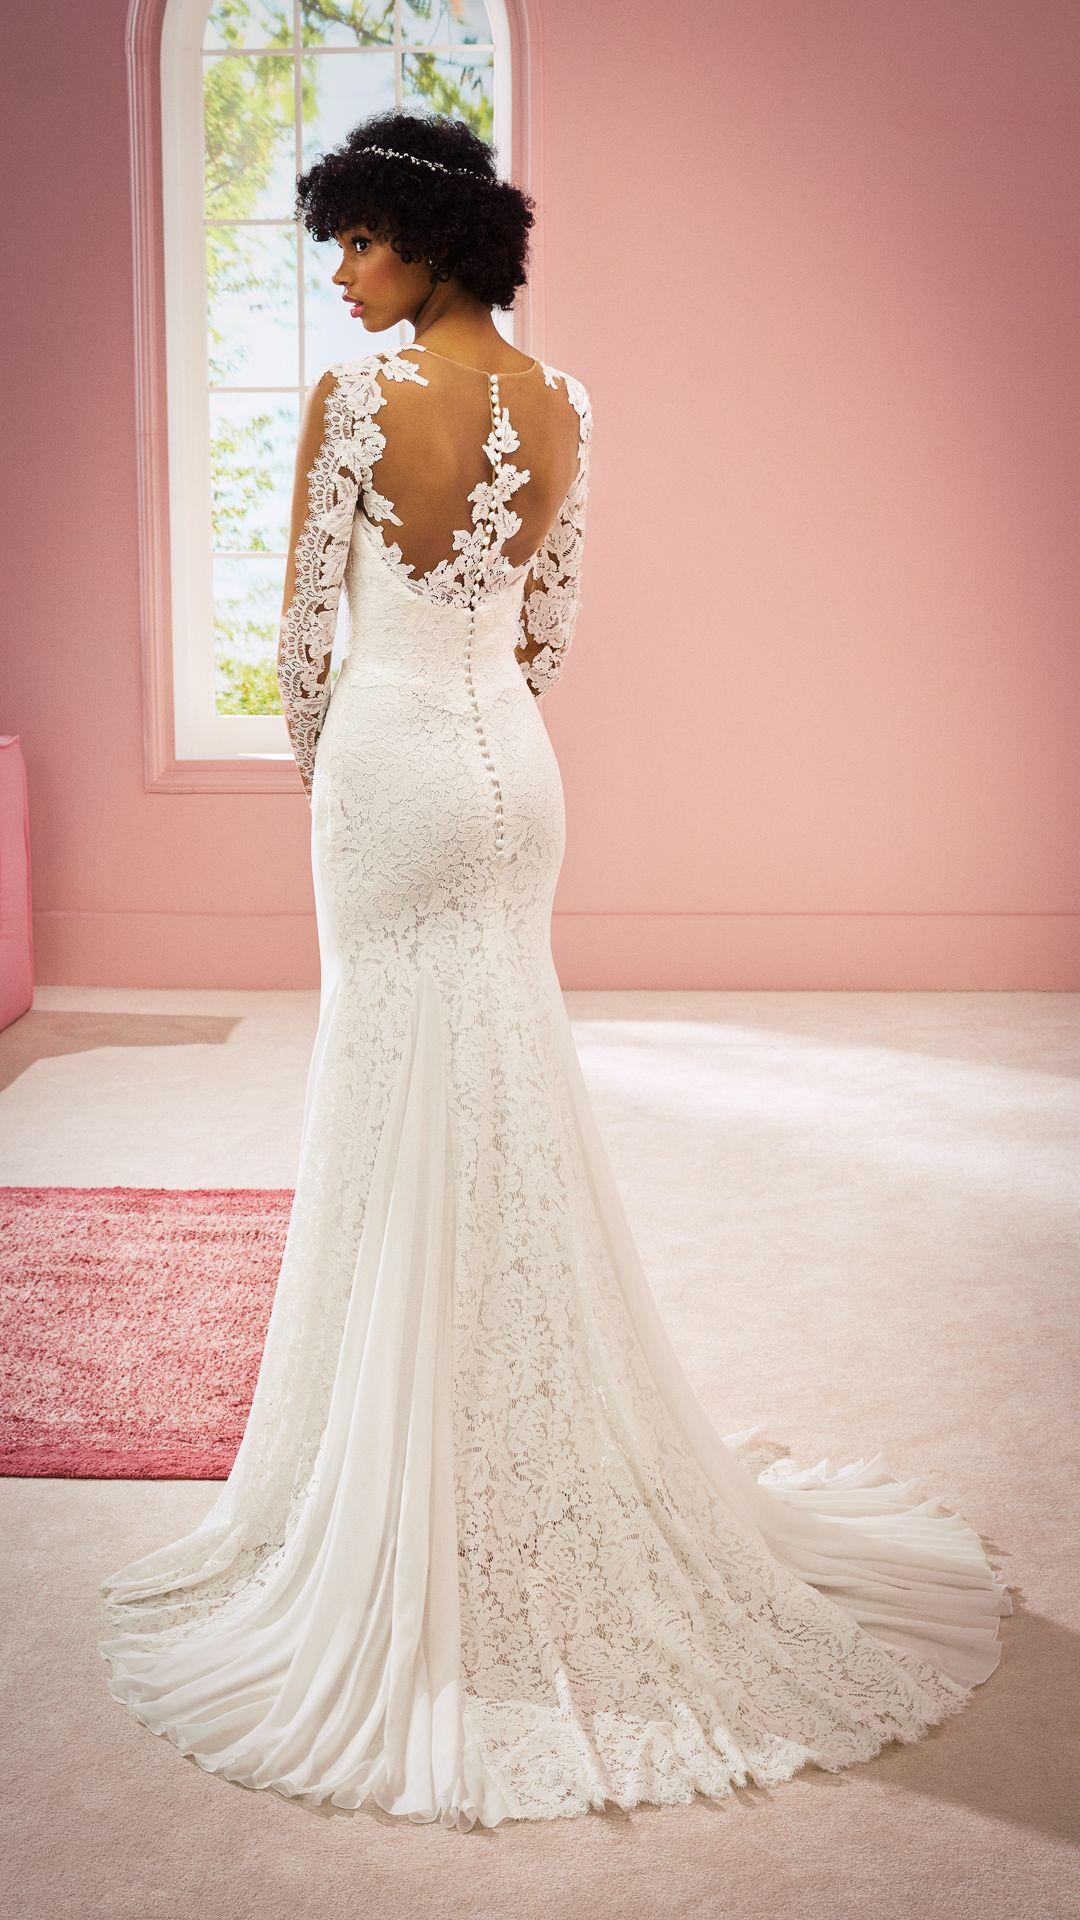 Hochzeitskleider 20 White One Kollektion Modell: ARLO-C